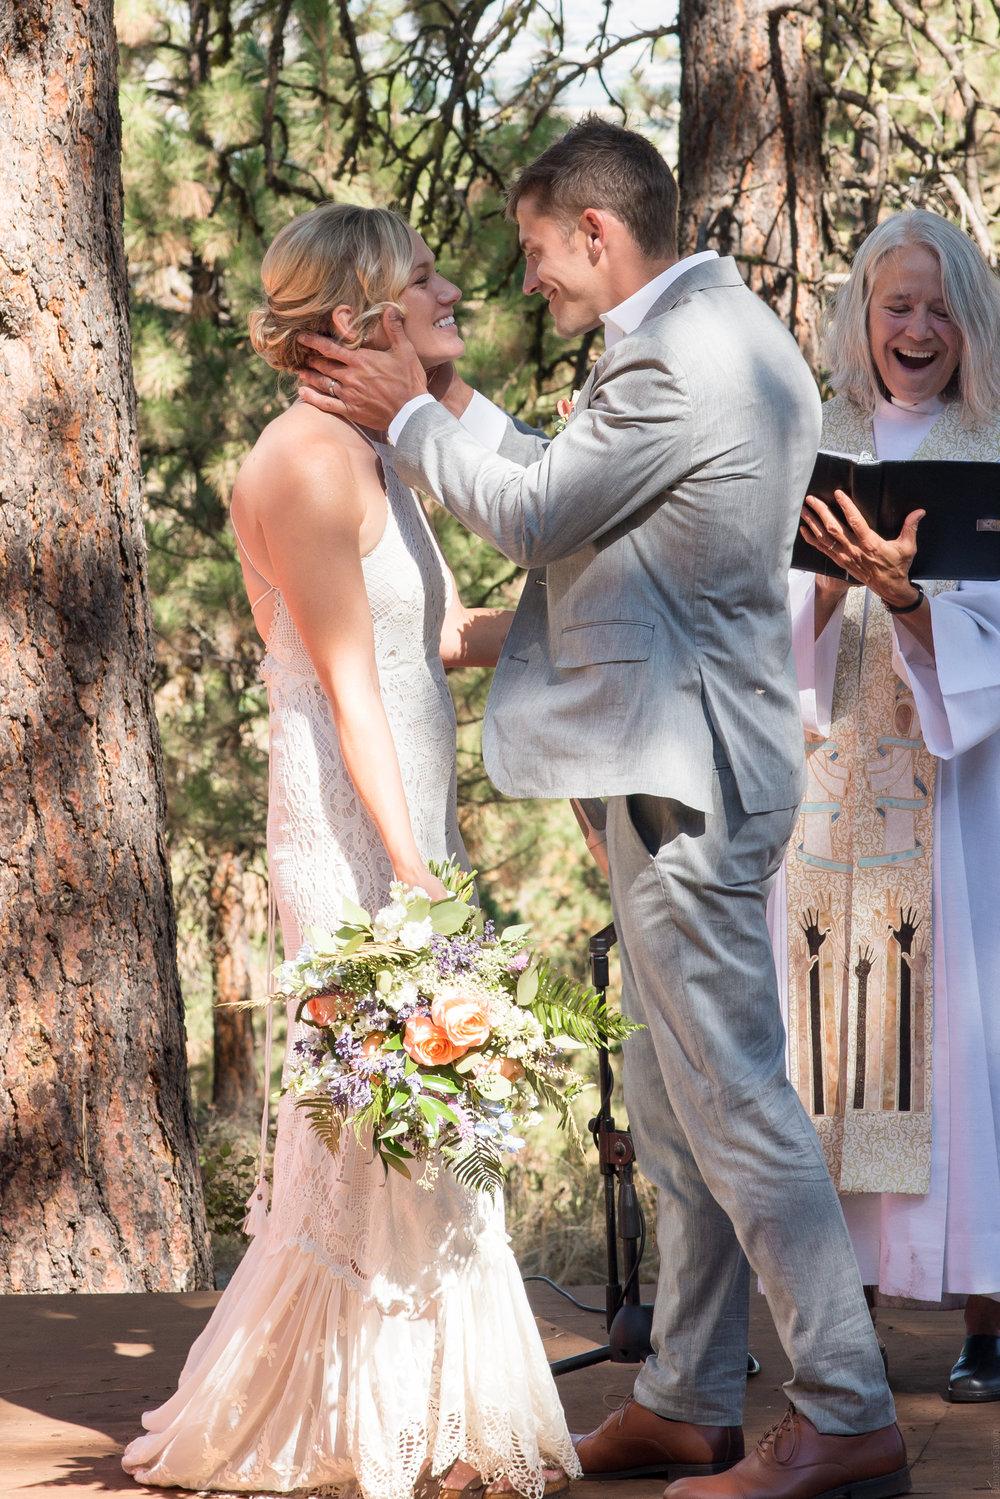 Lana Micah Wedding La Grande Oregon September 2018 Please Credit Talia Jean Galvin (87 of 687).jpg